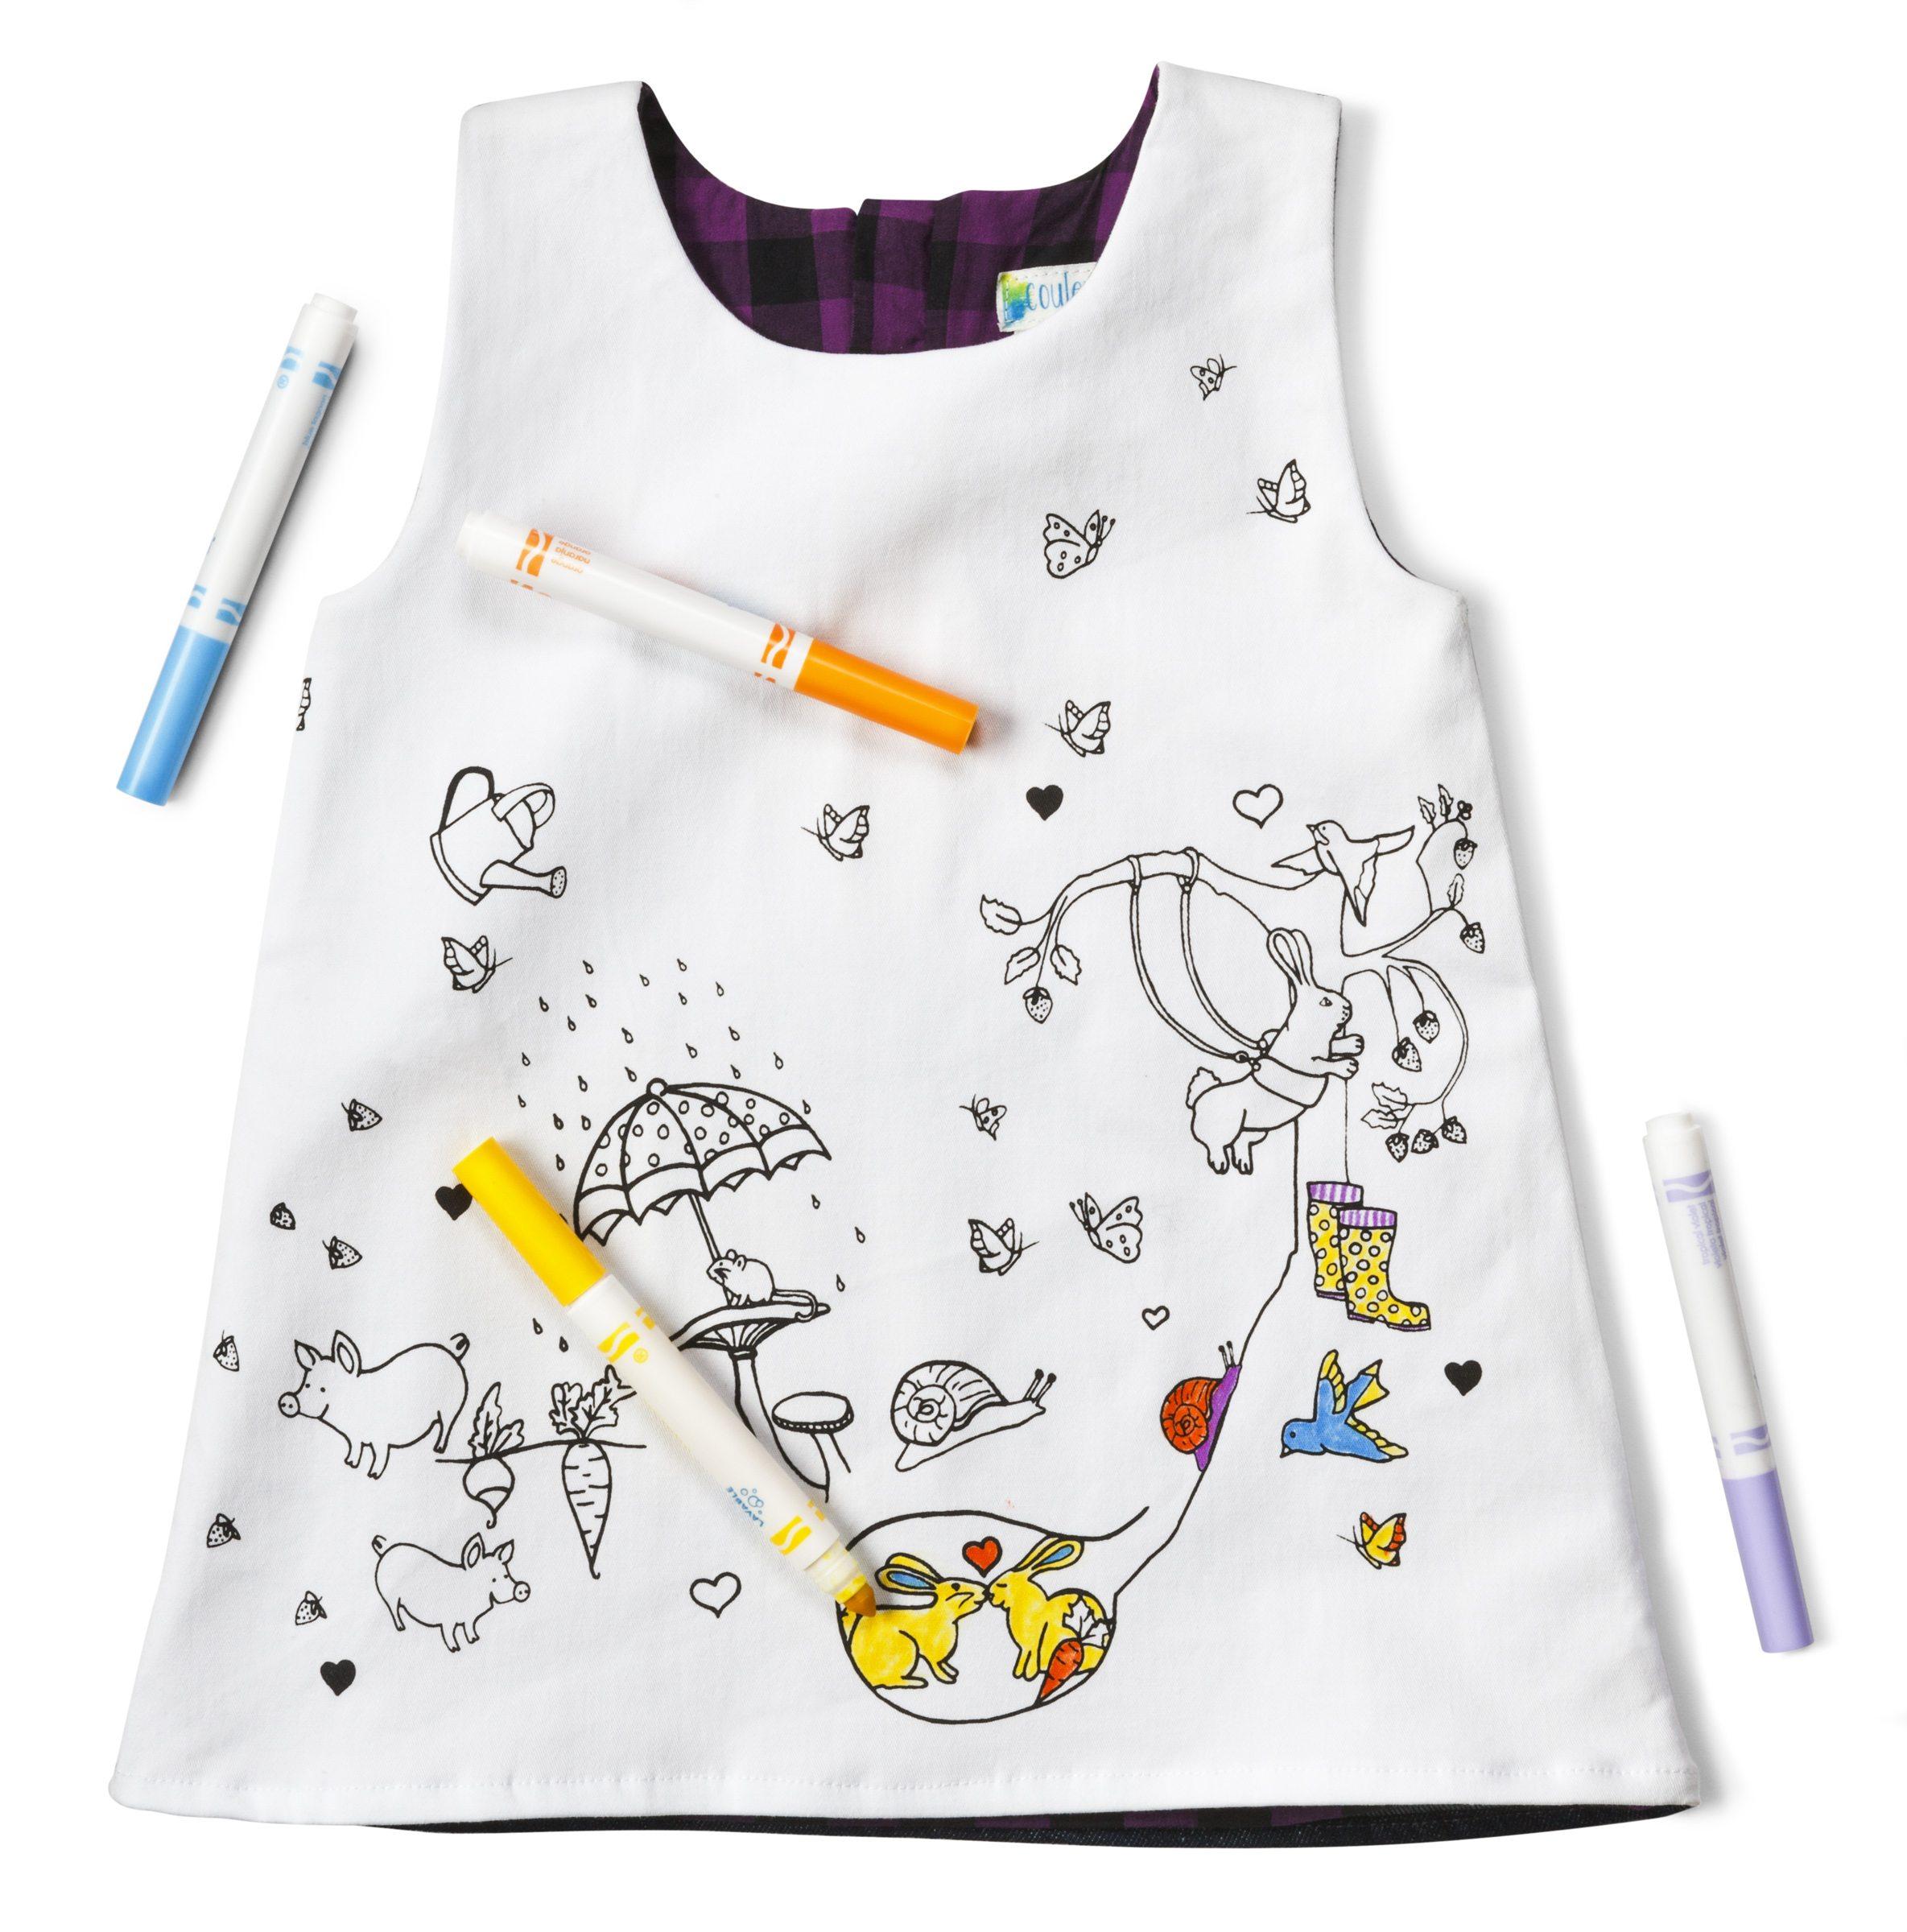 June bug tunic dress 1 $54 by Madeleine Bernatchez, Couleur-Moi